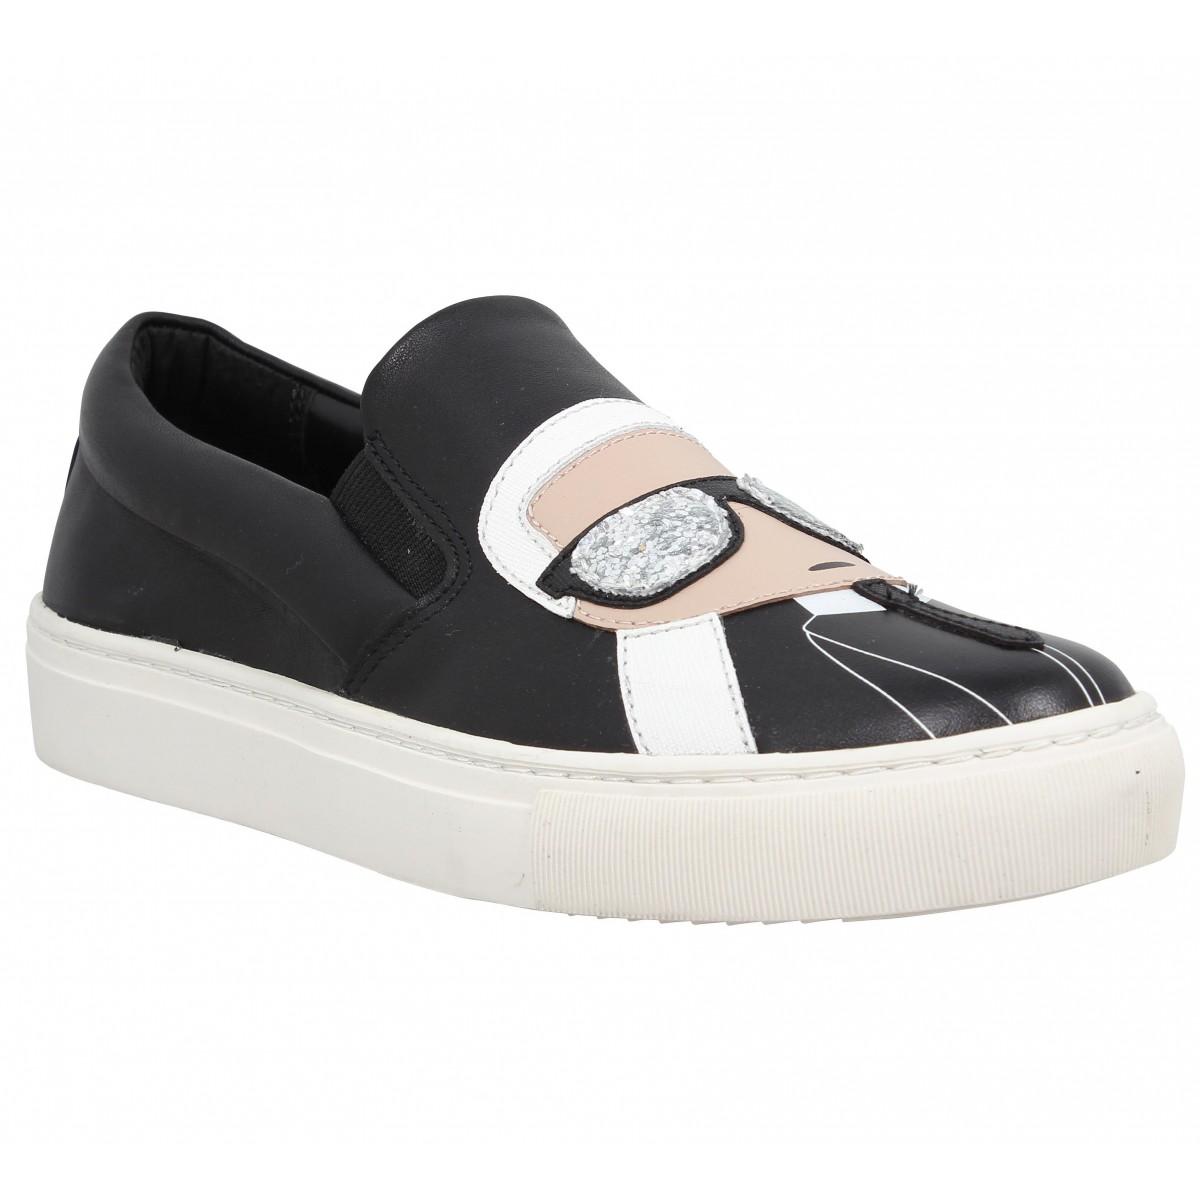 chaussure karl lagerfeld femme